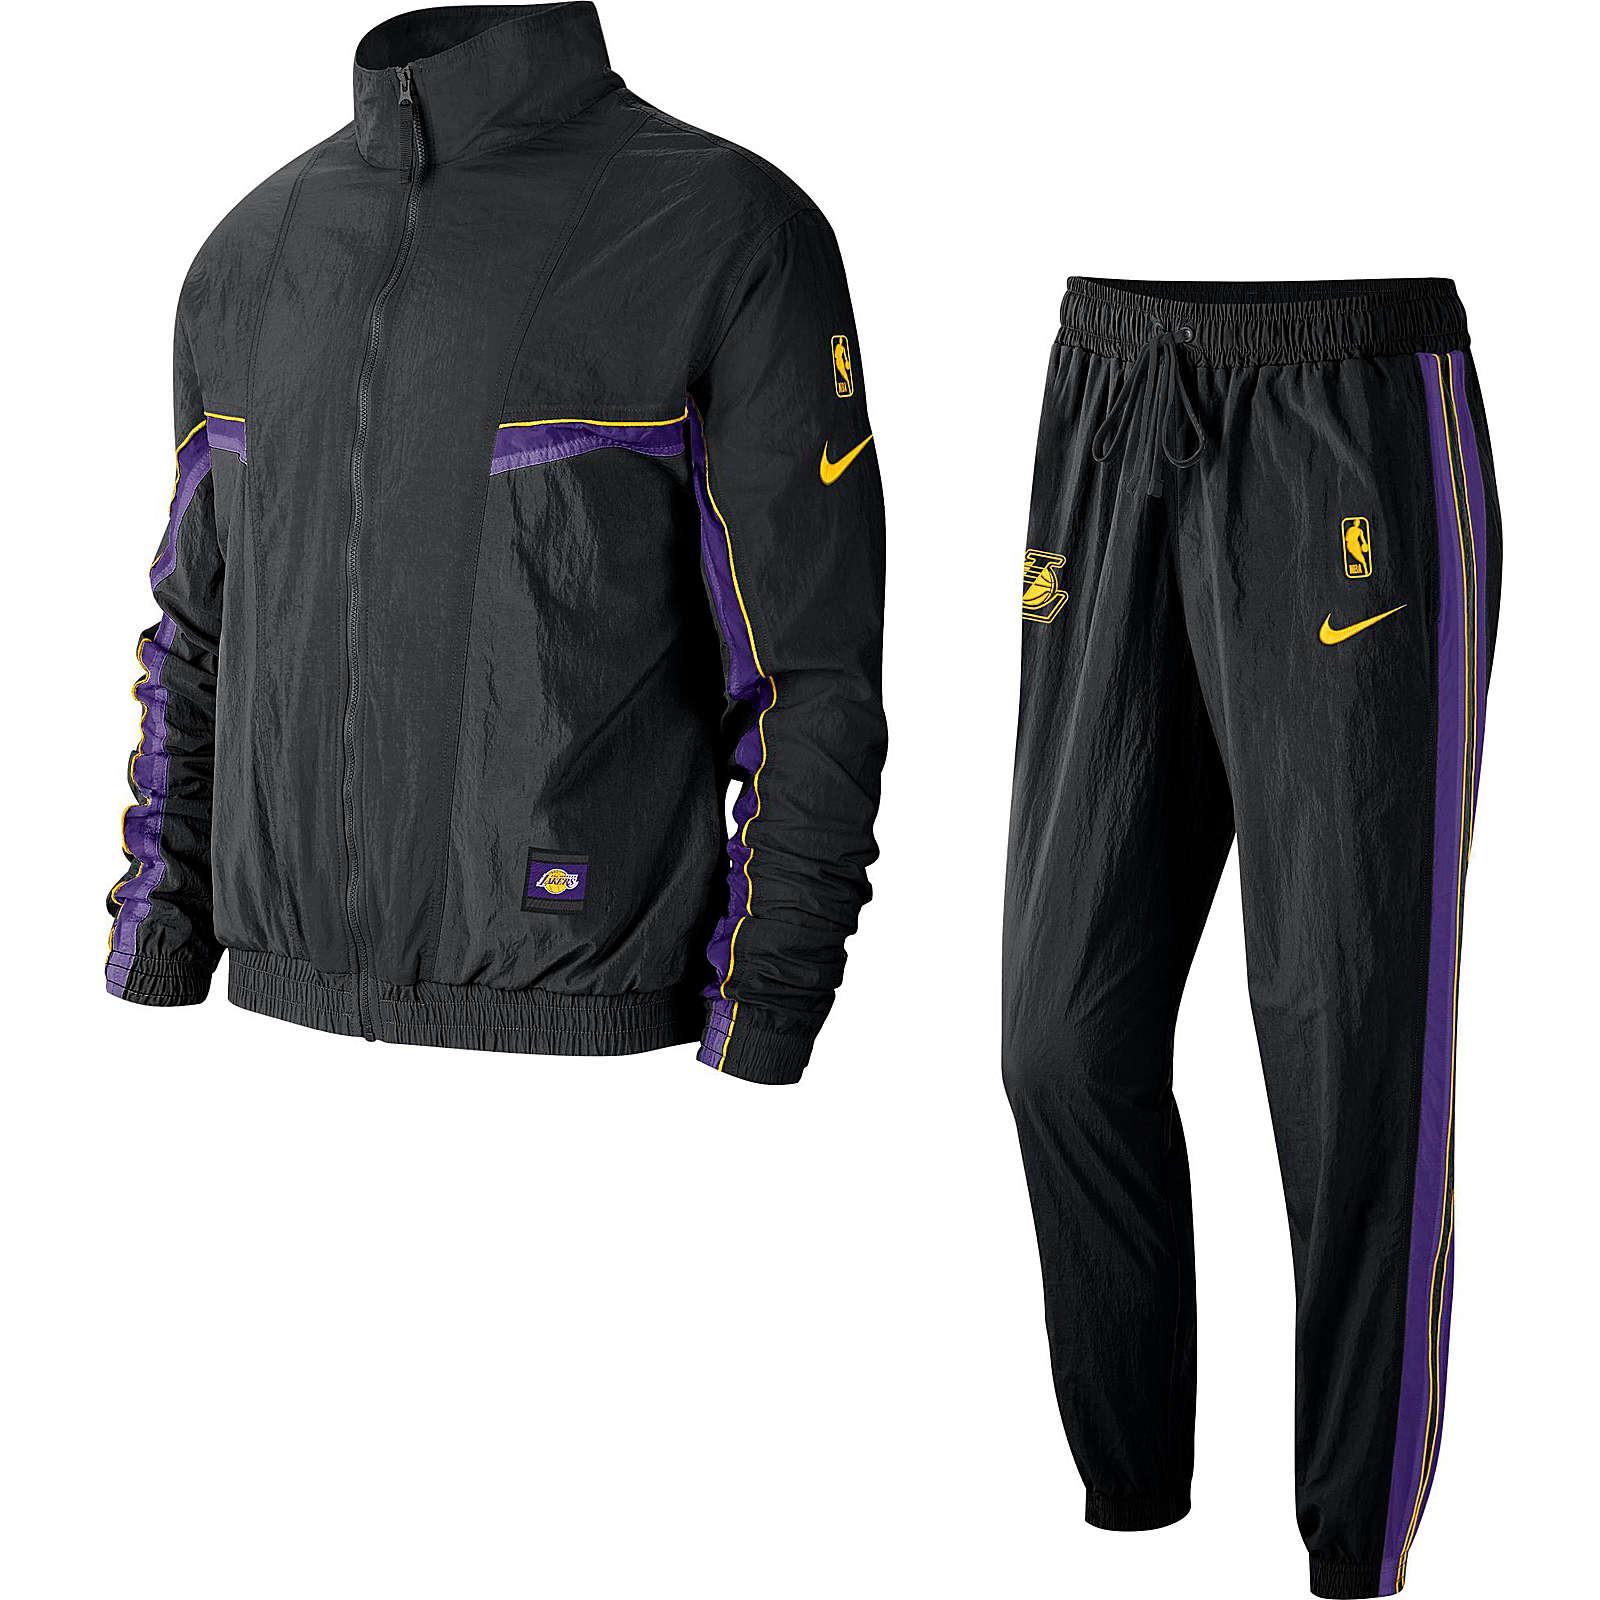 buy popular 48cfa 927da Nike Performance Trainingsanzug Los Angeles Lakers Trainingsanzüge schwarz  Herren Gr. 48